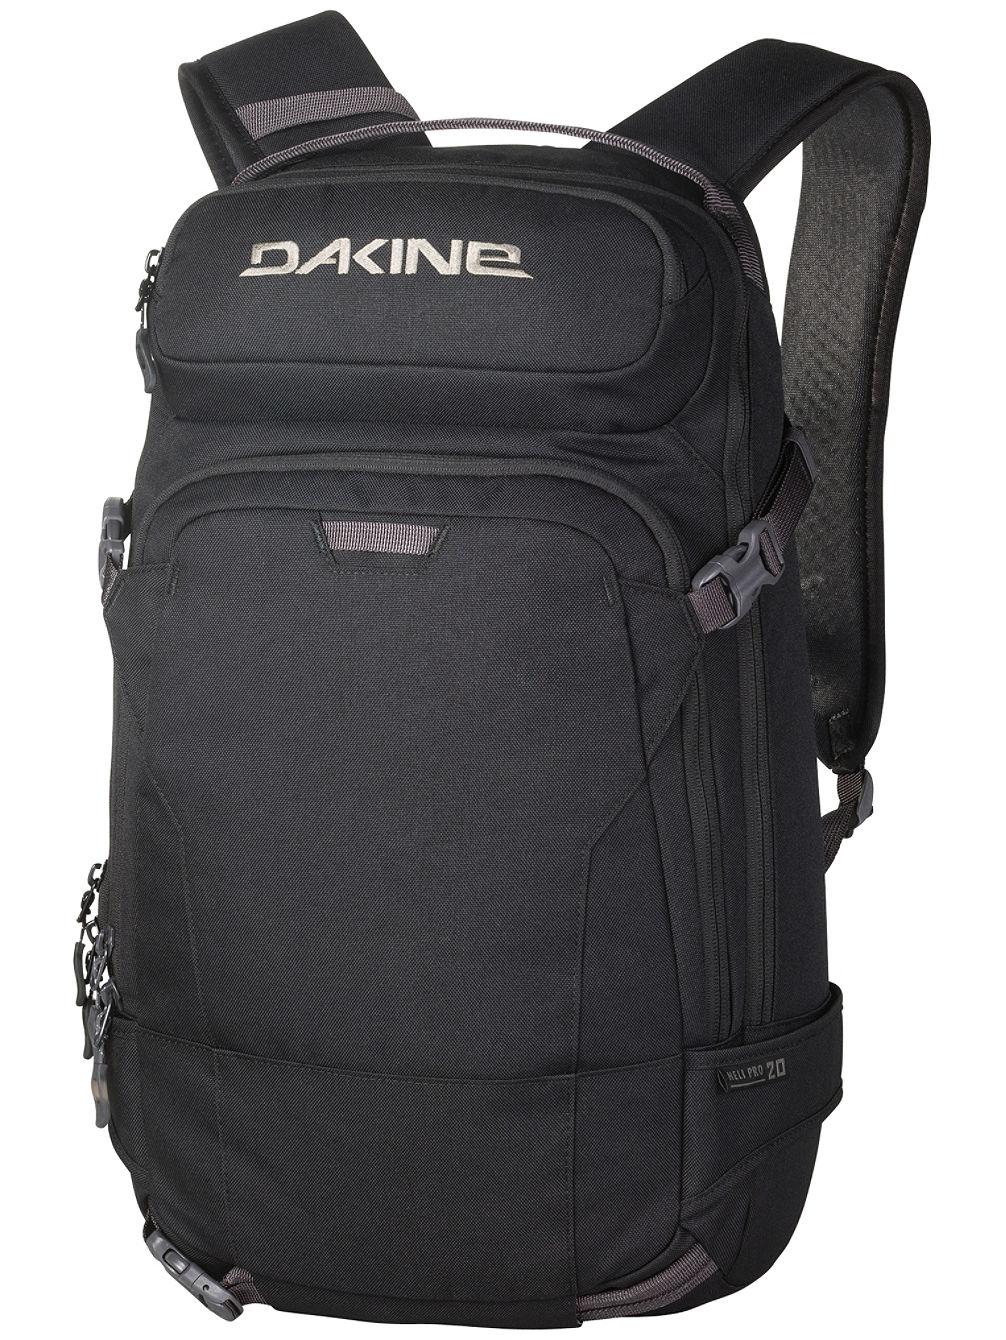 f5fb2df9a12 Buy Dakine Heli Pro 20L Backpack online at blue-tomato.com